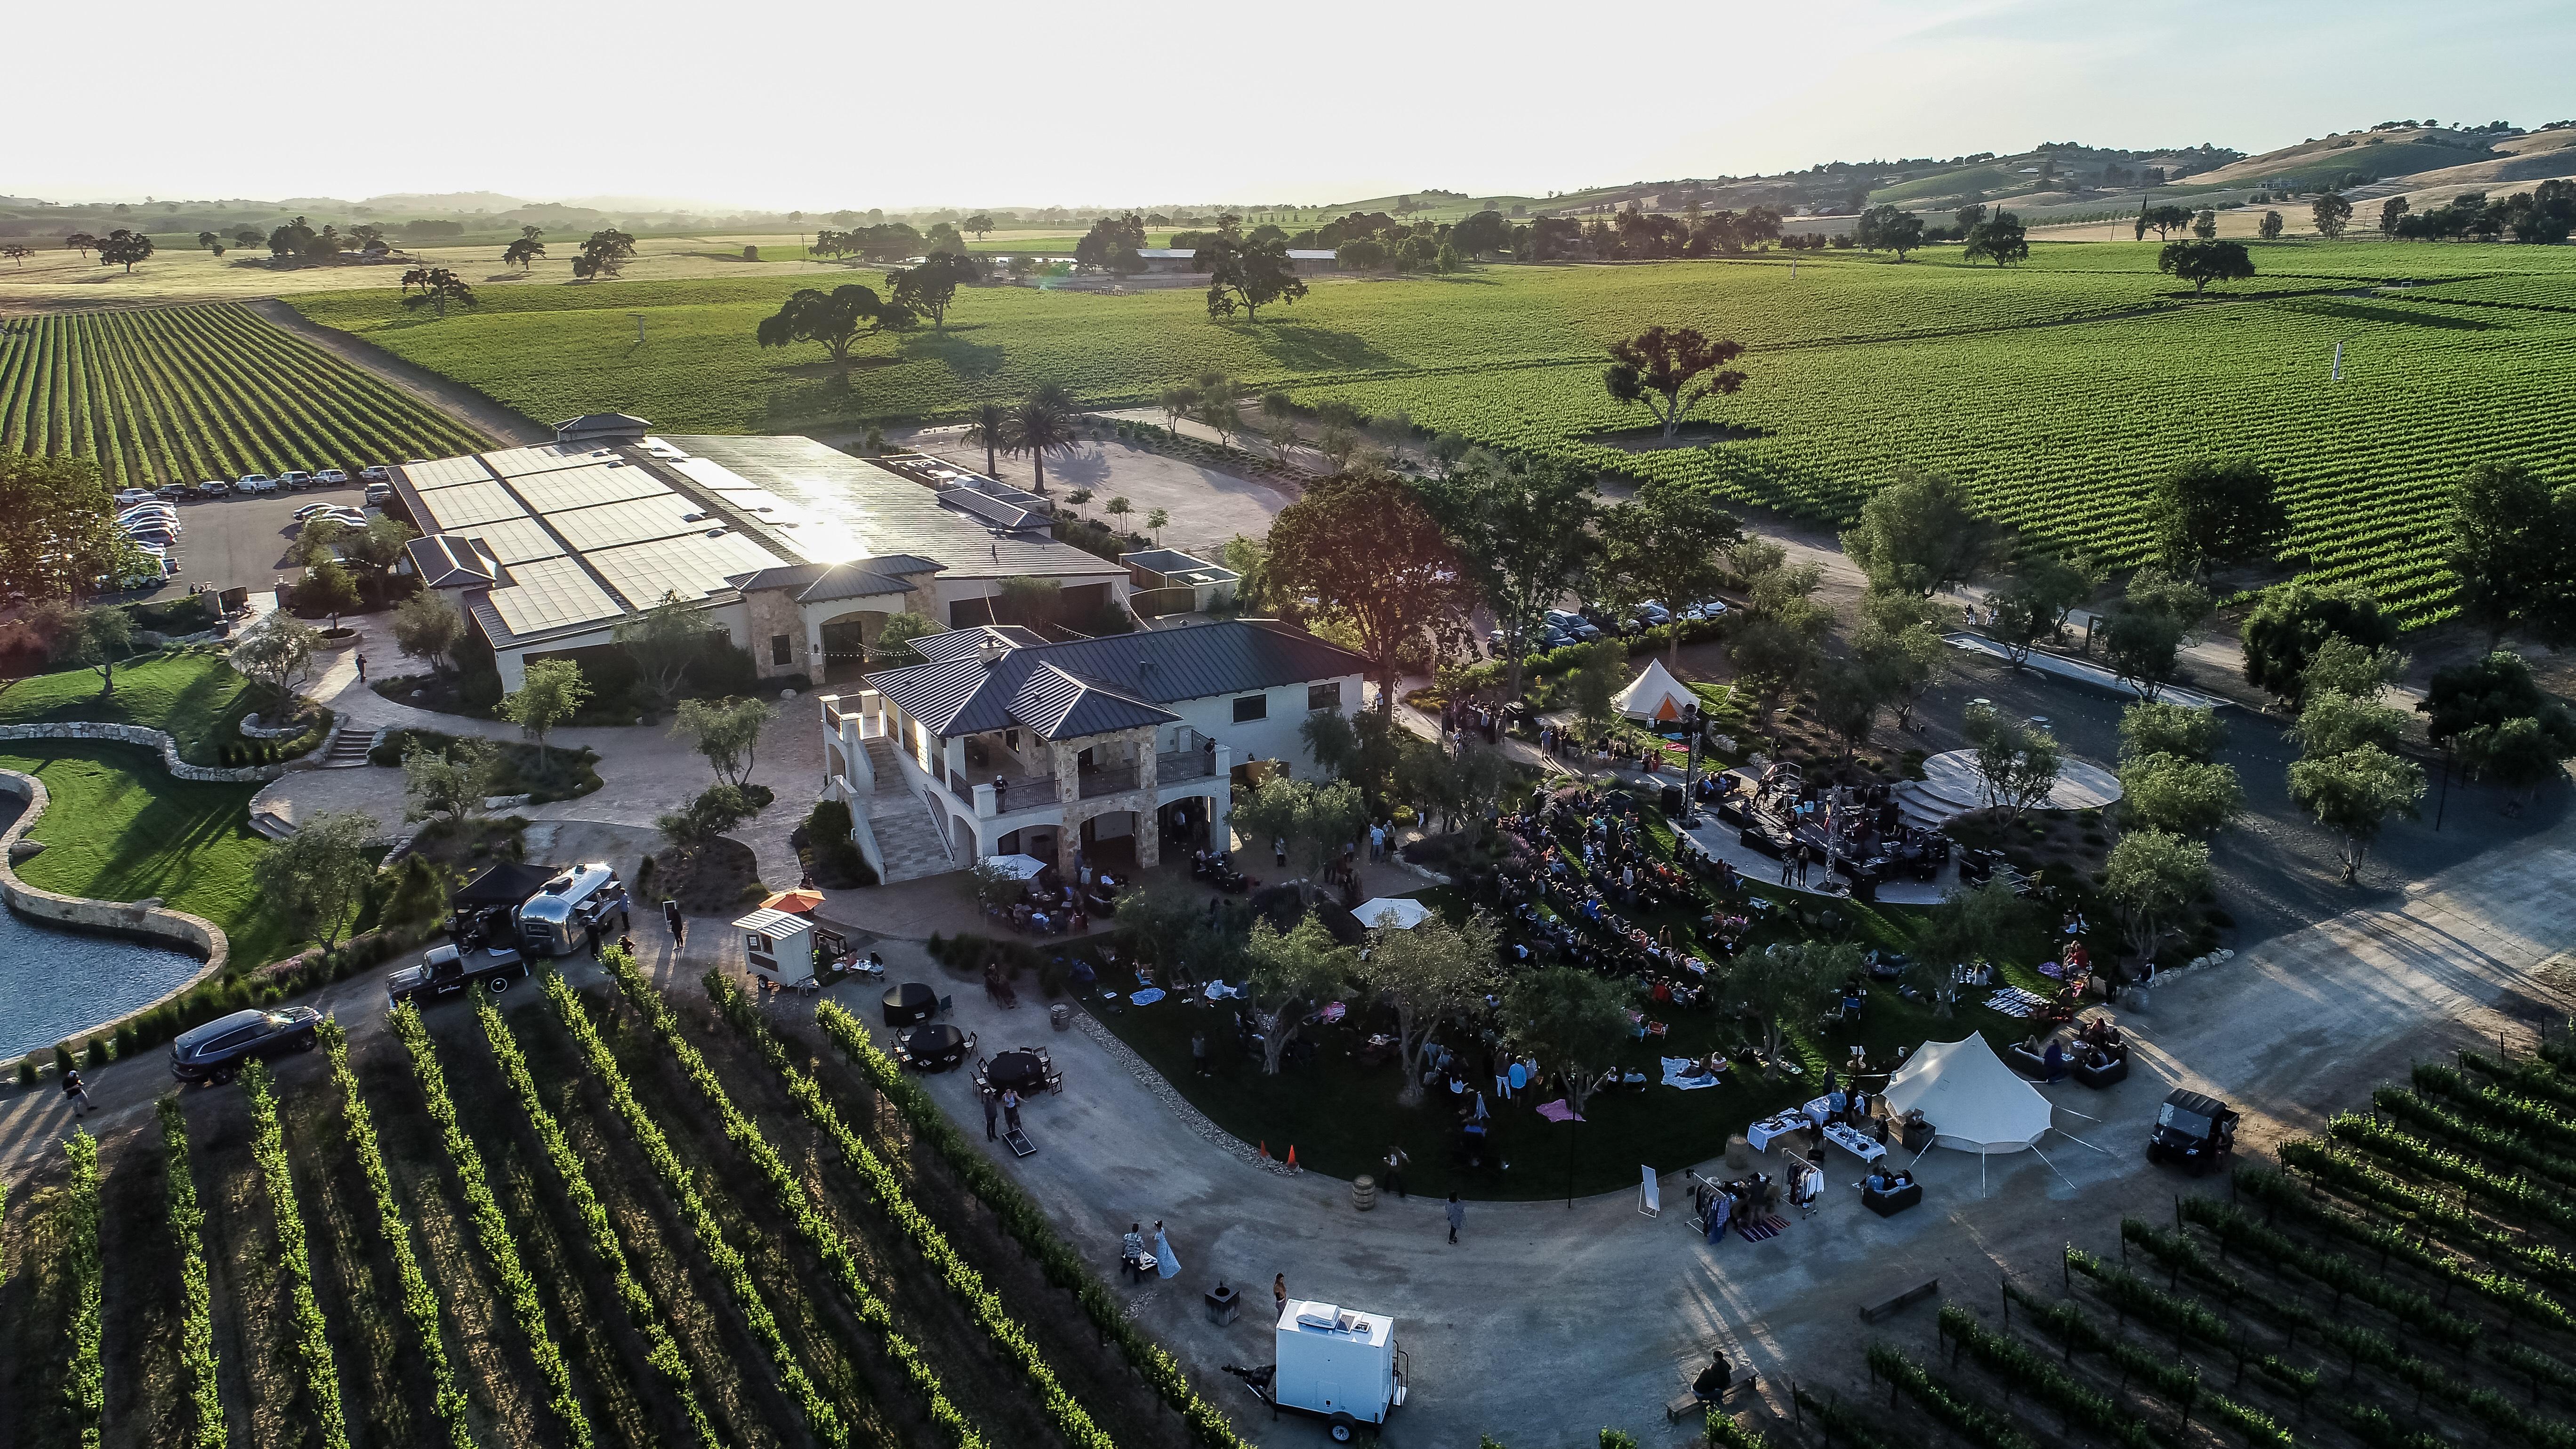 Rava Wine and Events